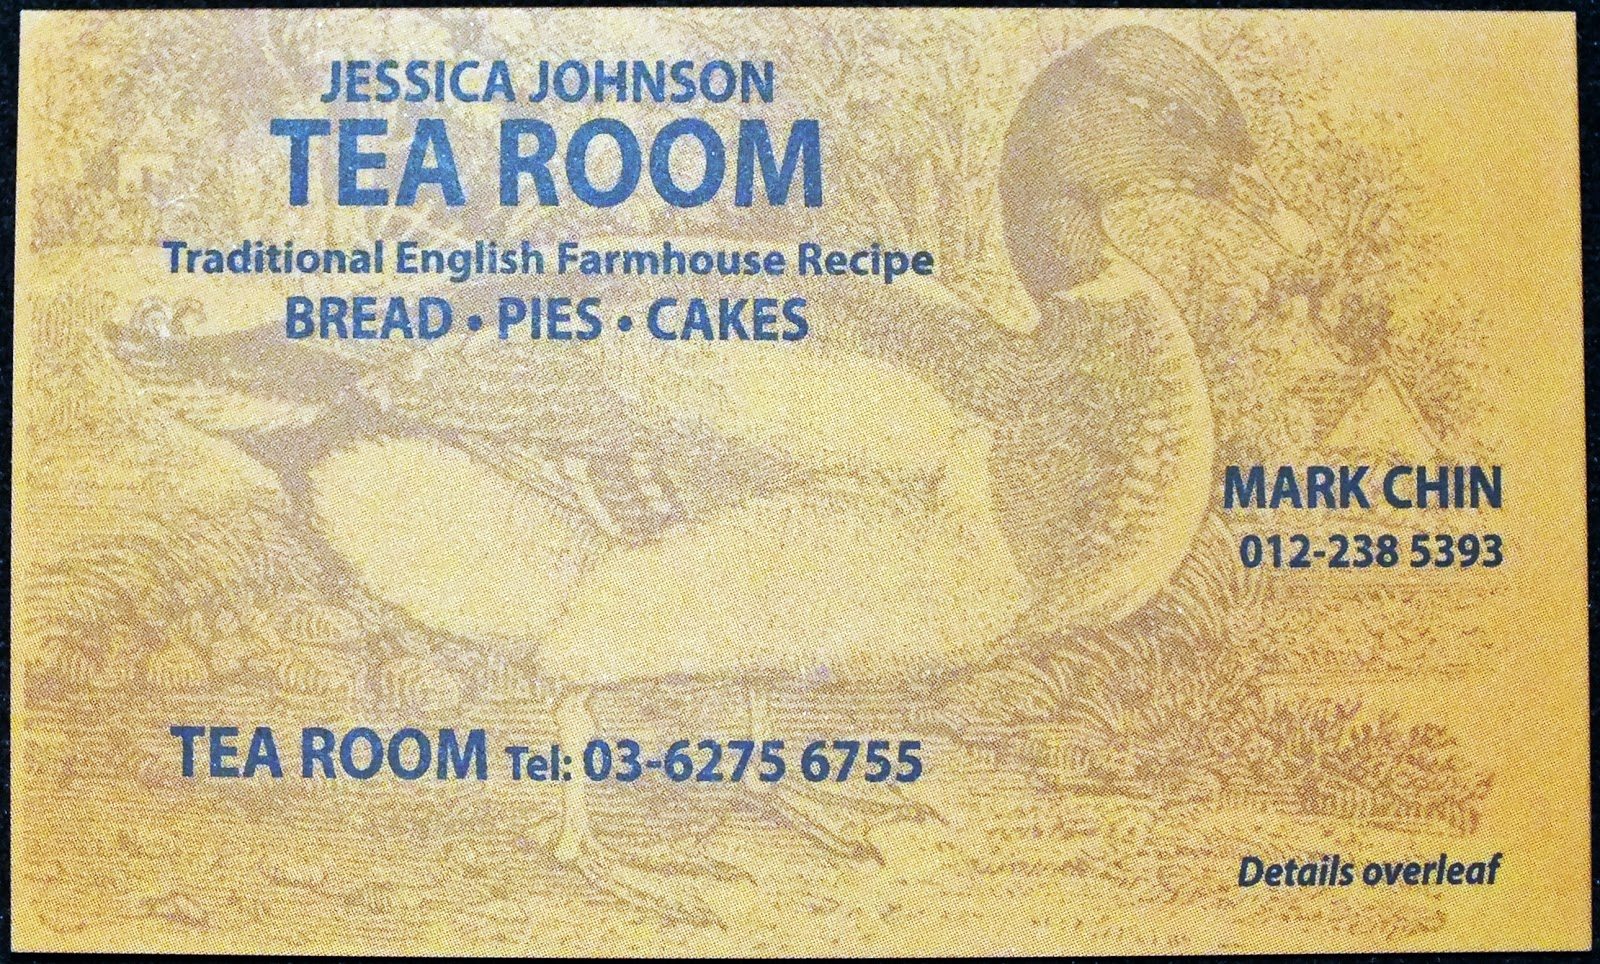 Jessica Johnson Tea Room